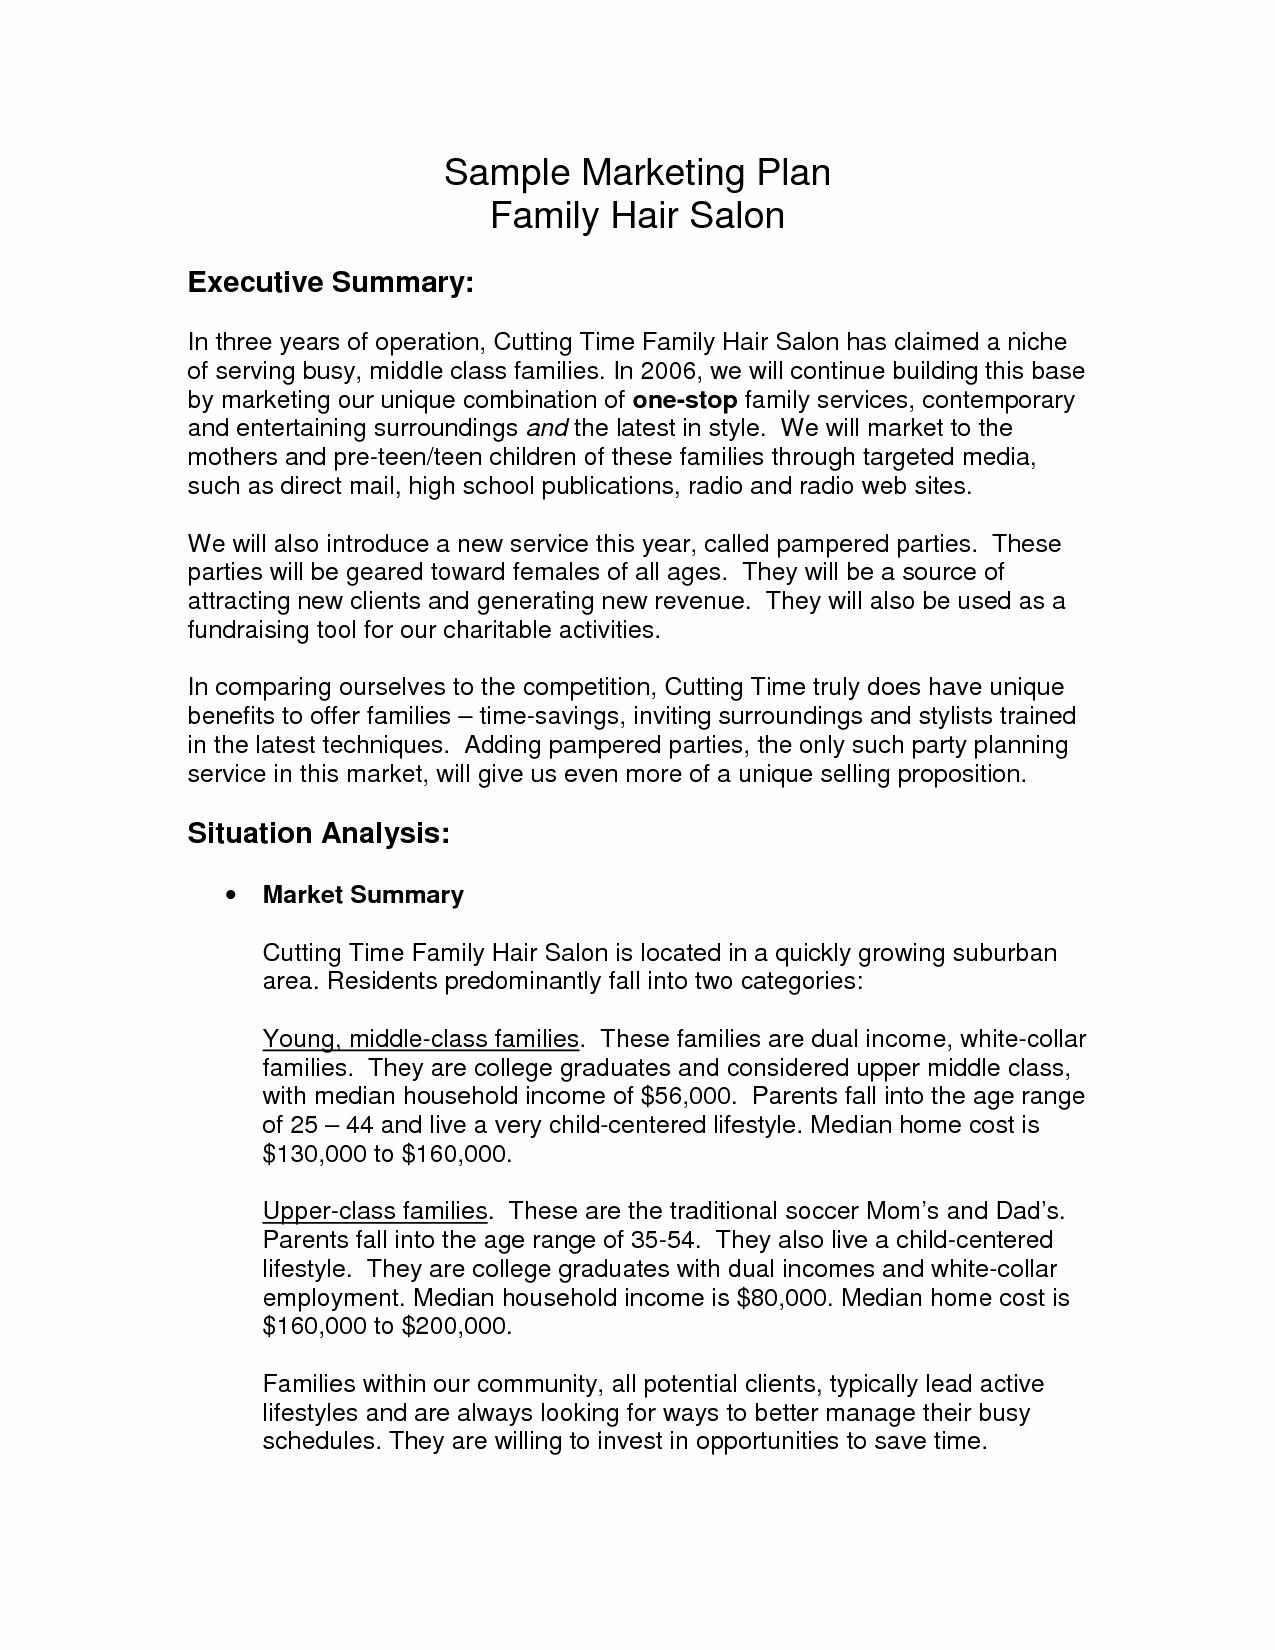 Hair Salon Business Plan Pdf Awesome Hair Salon Business Plan Sample